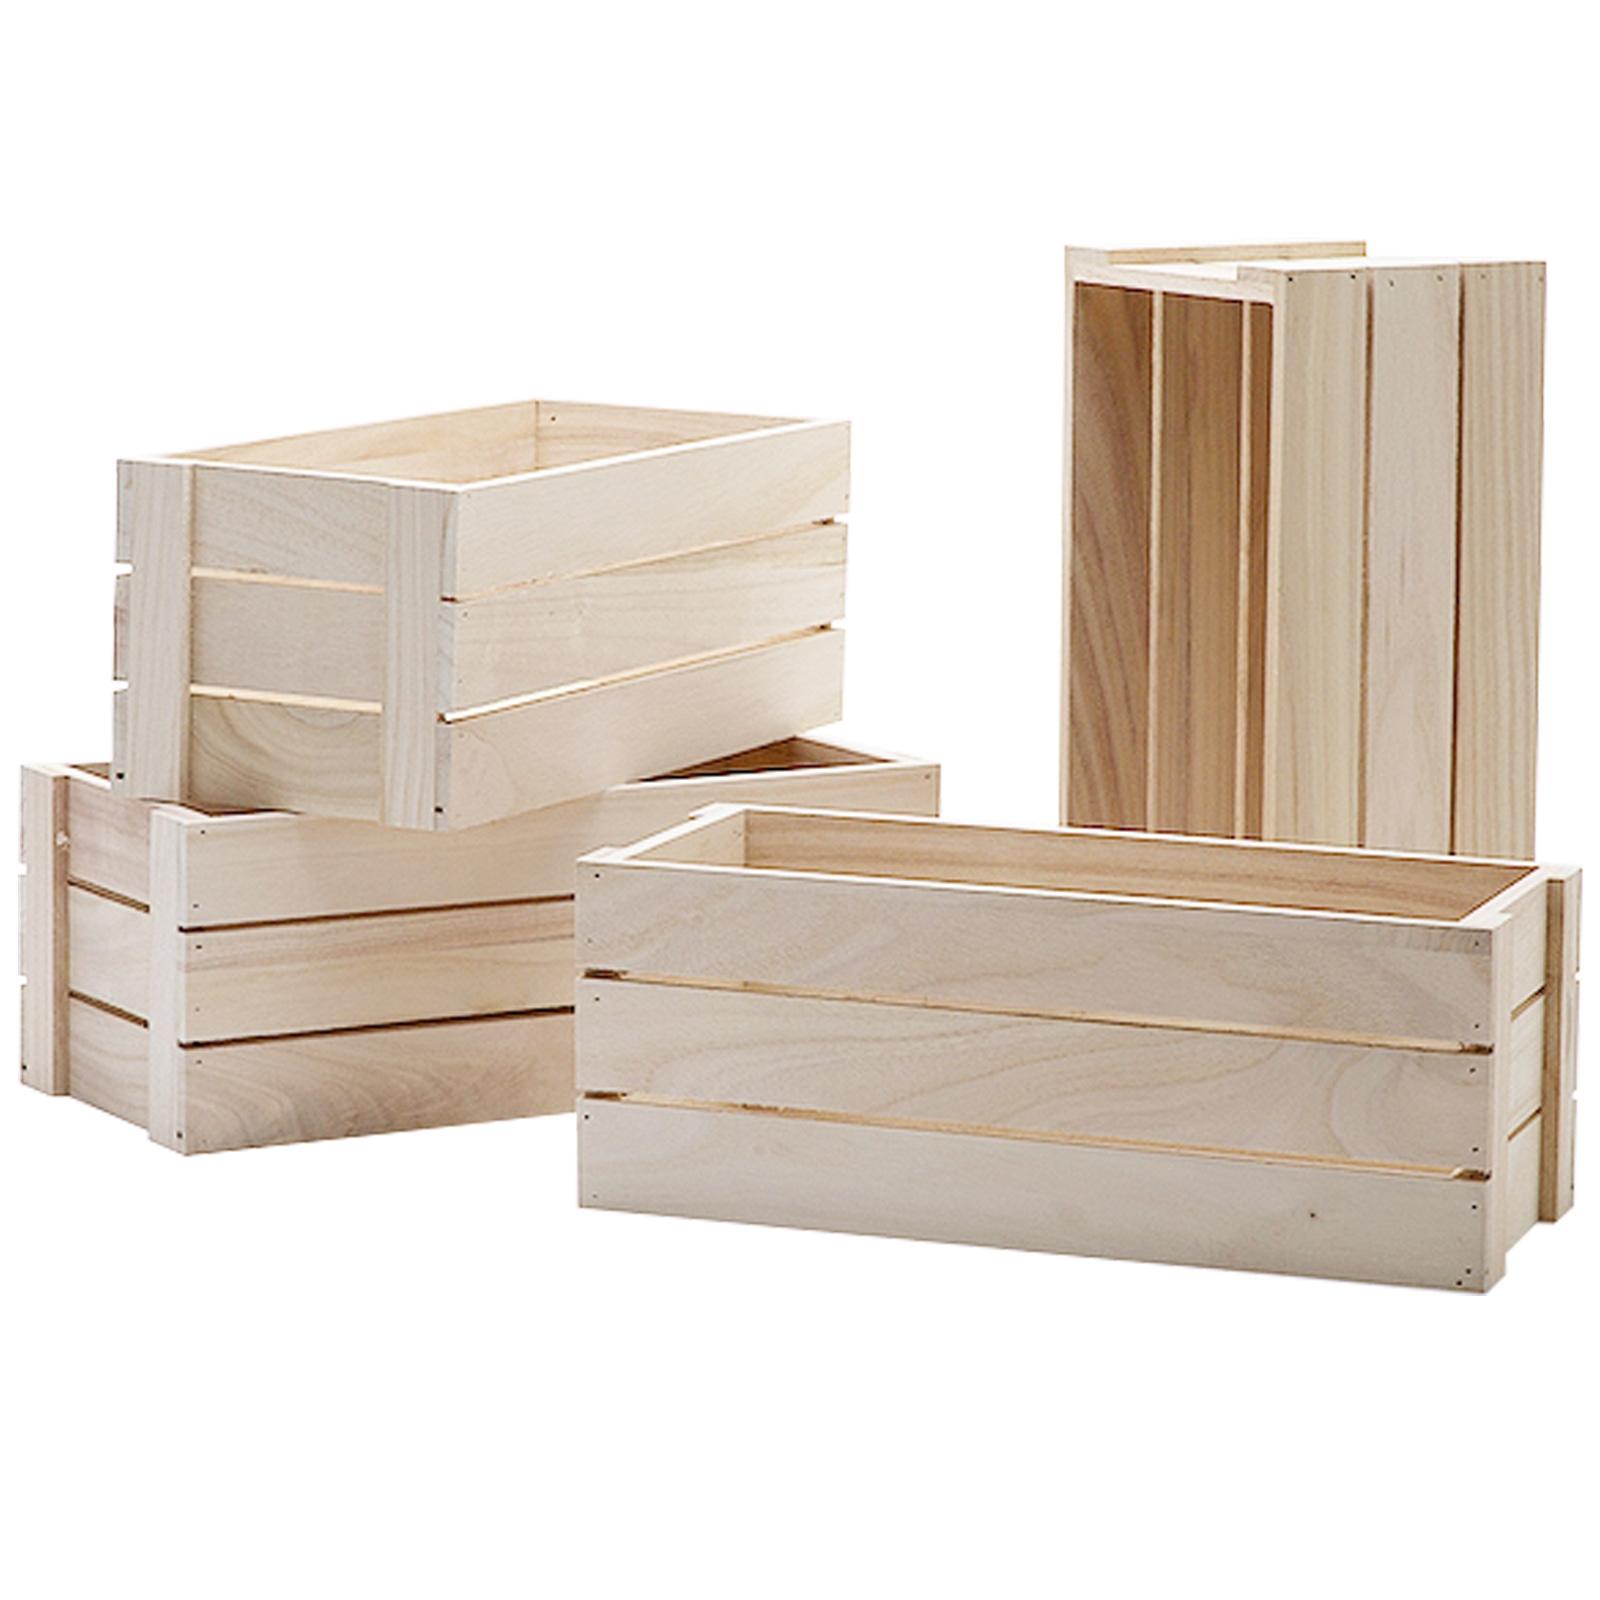 Wooden Crates, Apple Boxes & Planters